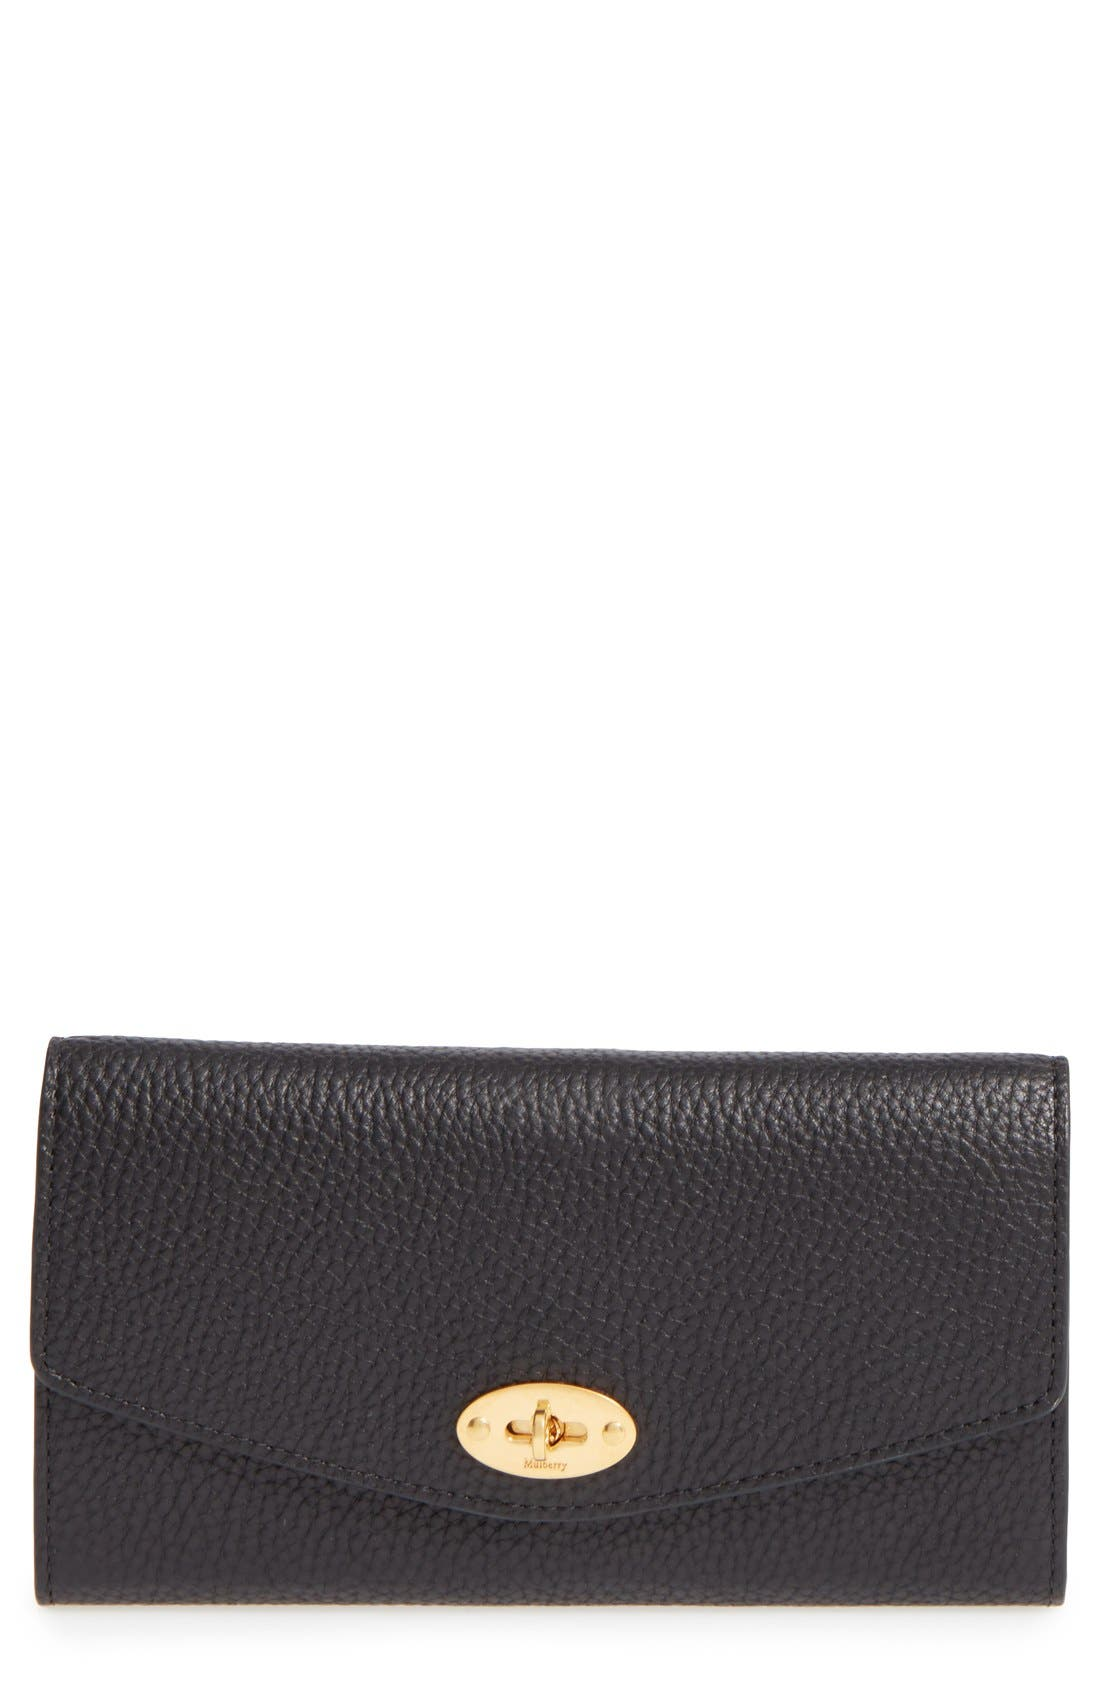 'Postman's Lock' Leather Wallet,                         Main,                         color, BLACK